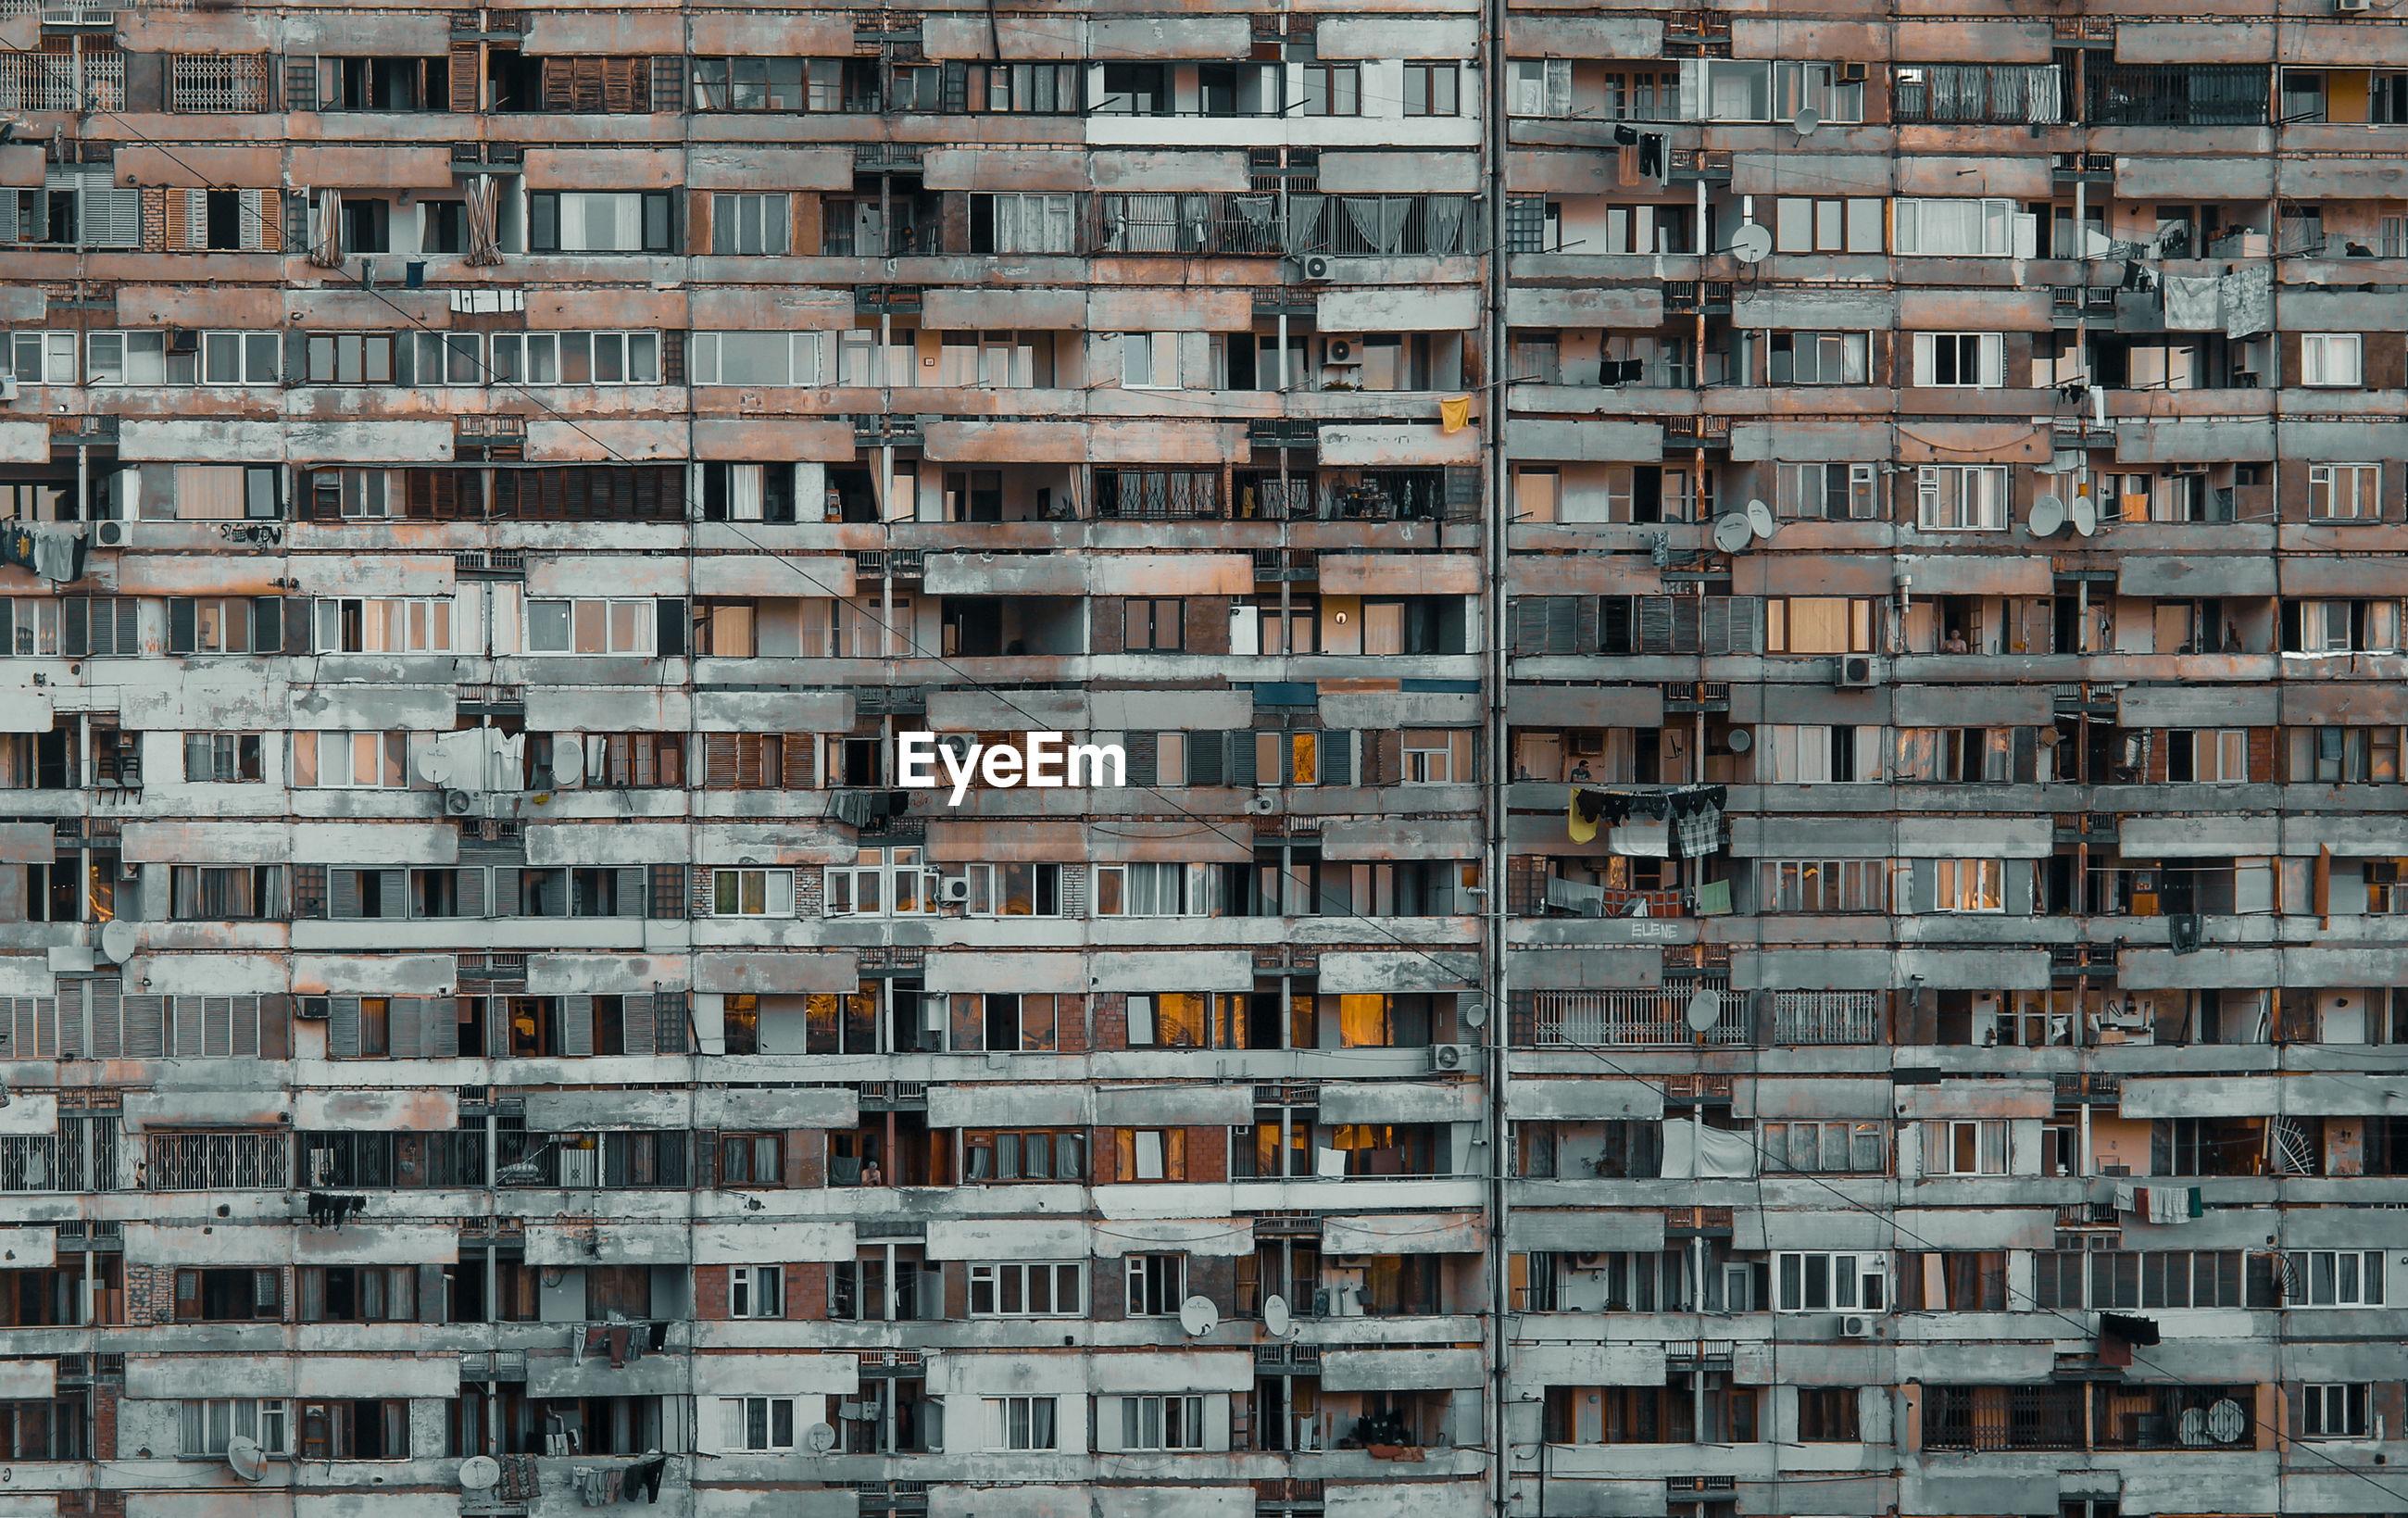 Brutalist architecture in tbilisi